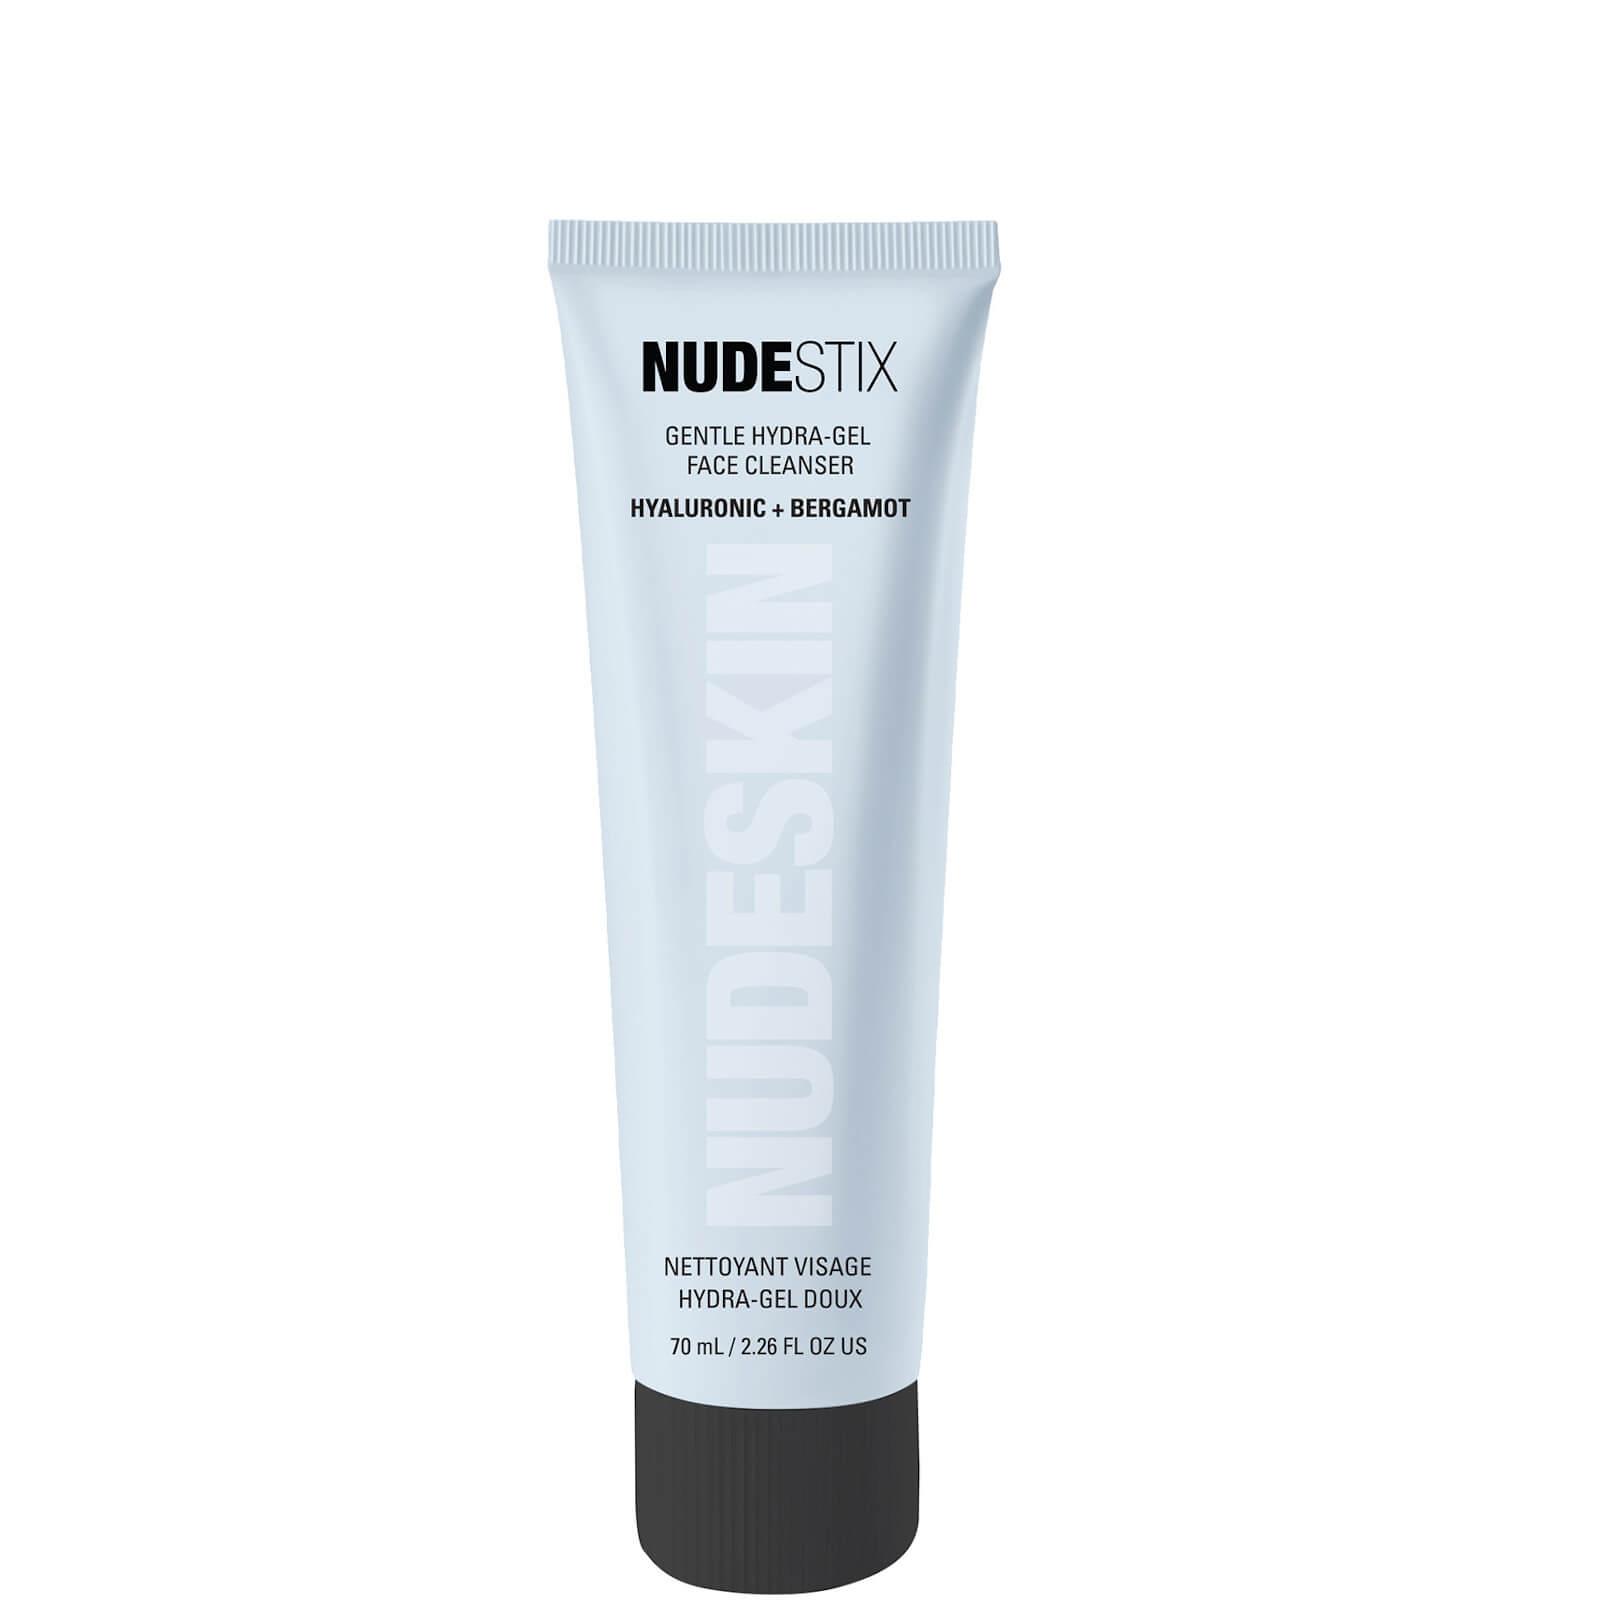 Купить NUDESTIX Nudeskin Gentle Hydra-Gel Face Cleanser 70ml